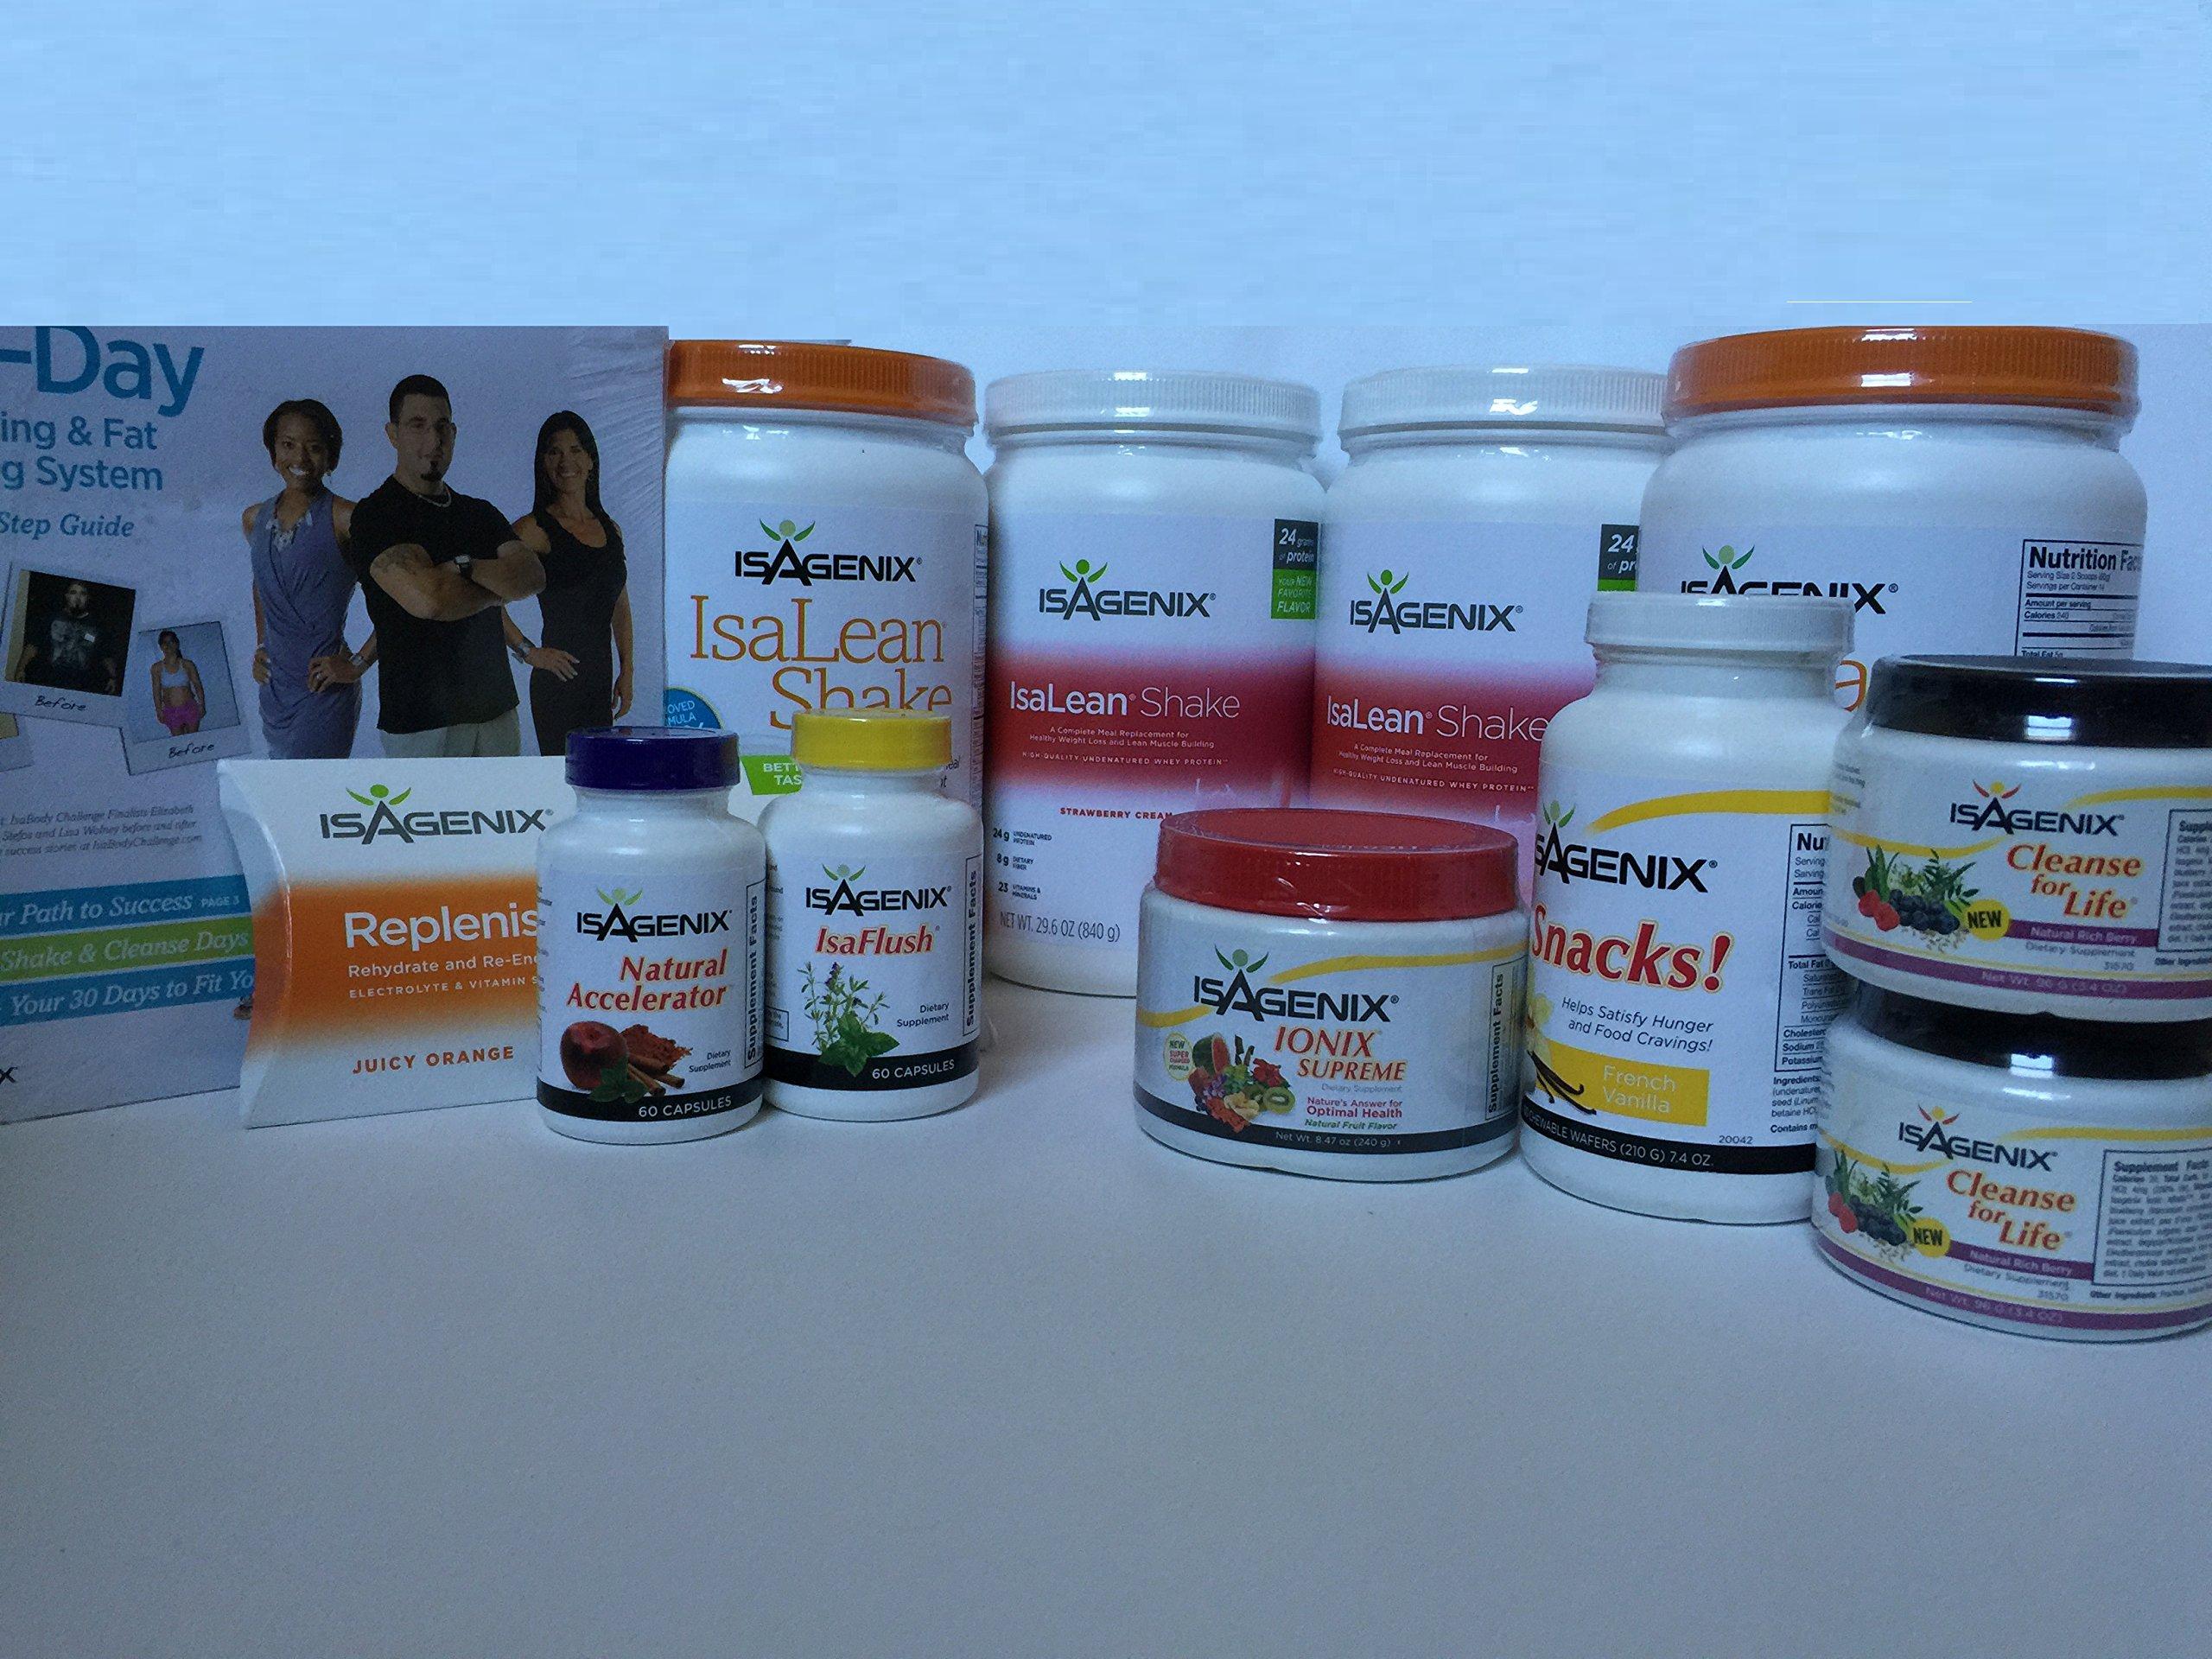 Isagenix 30 Day Weight Loss System with 2 Strawberry Cream, 2 Creamy French Vanilla Shake